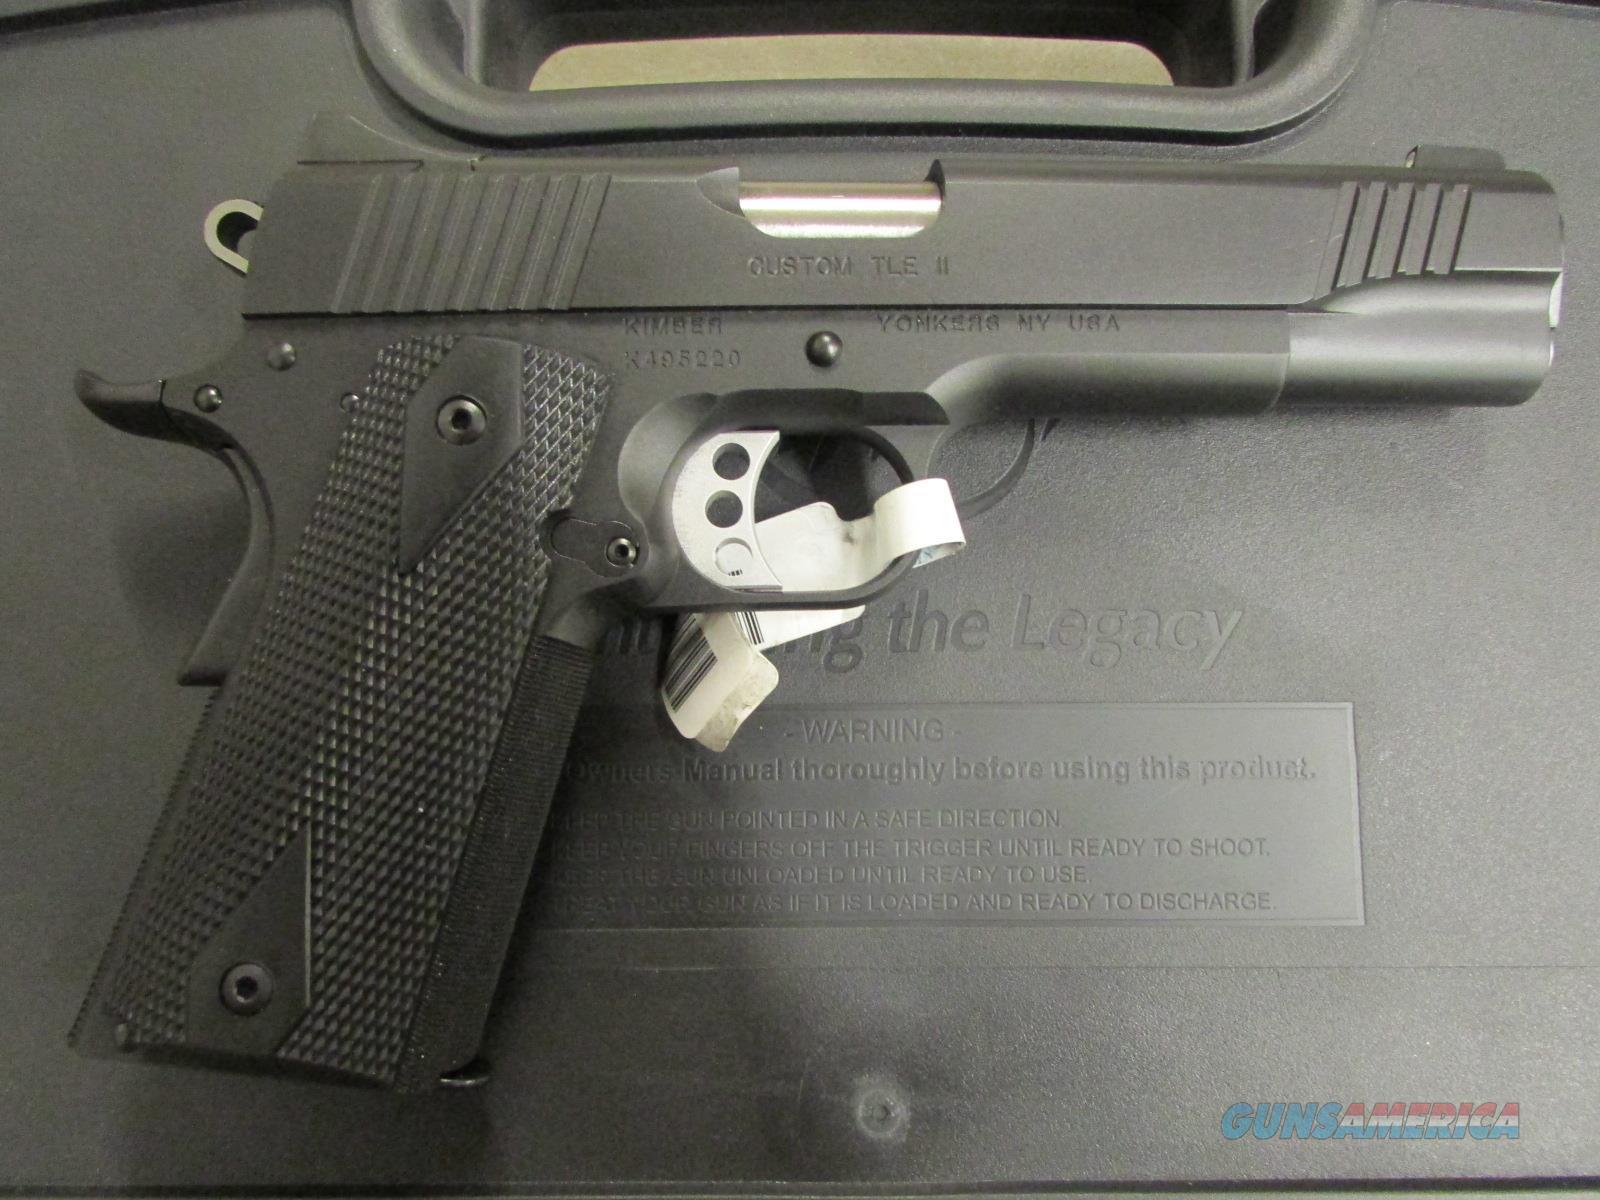 kimber custom tle ii 1911 45 acp 3200068 for sale rh gunsamerica com Remington 1911 kimber 1911 user manual